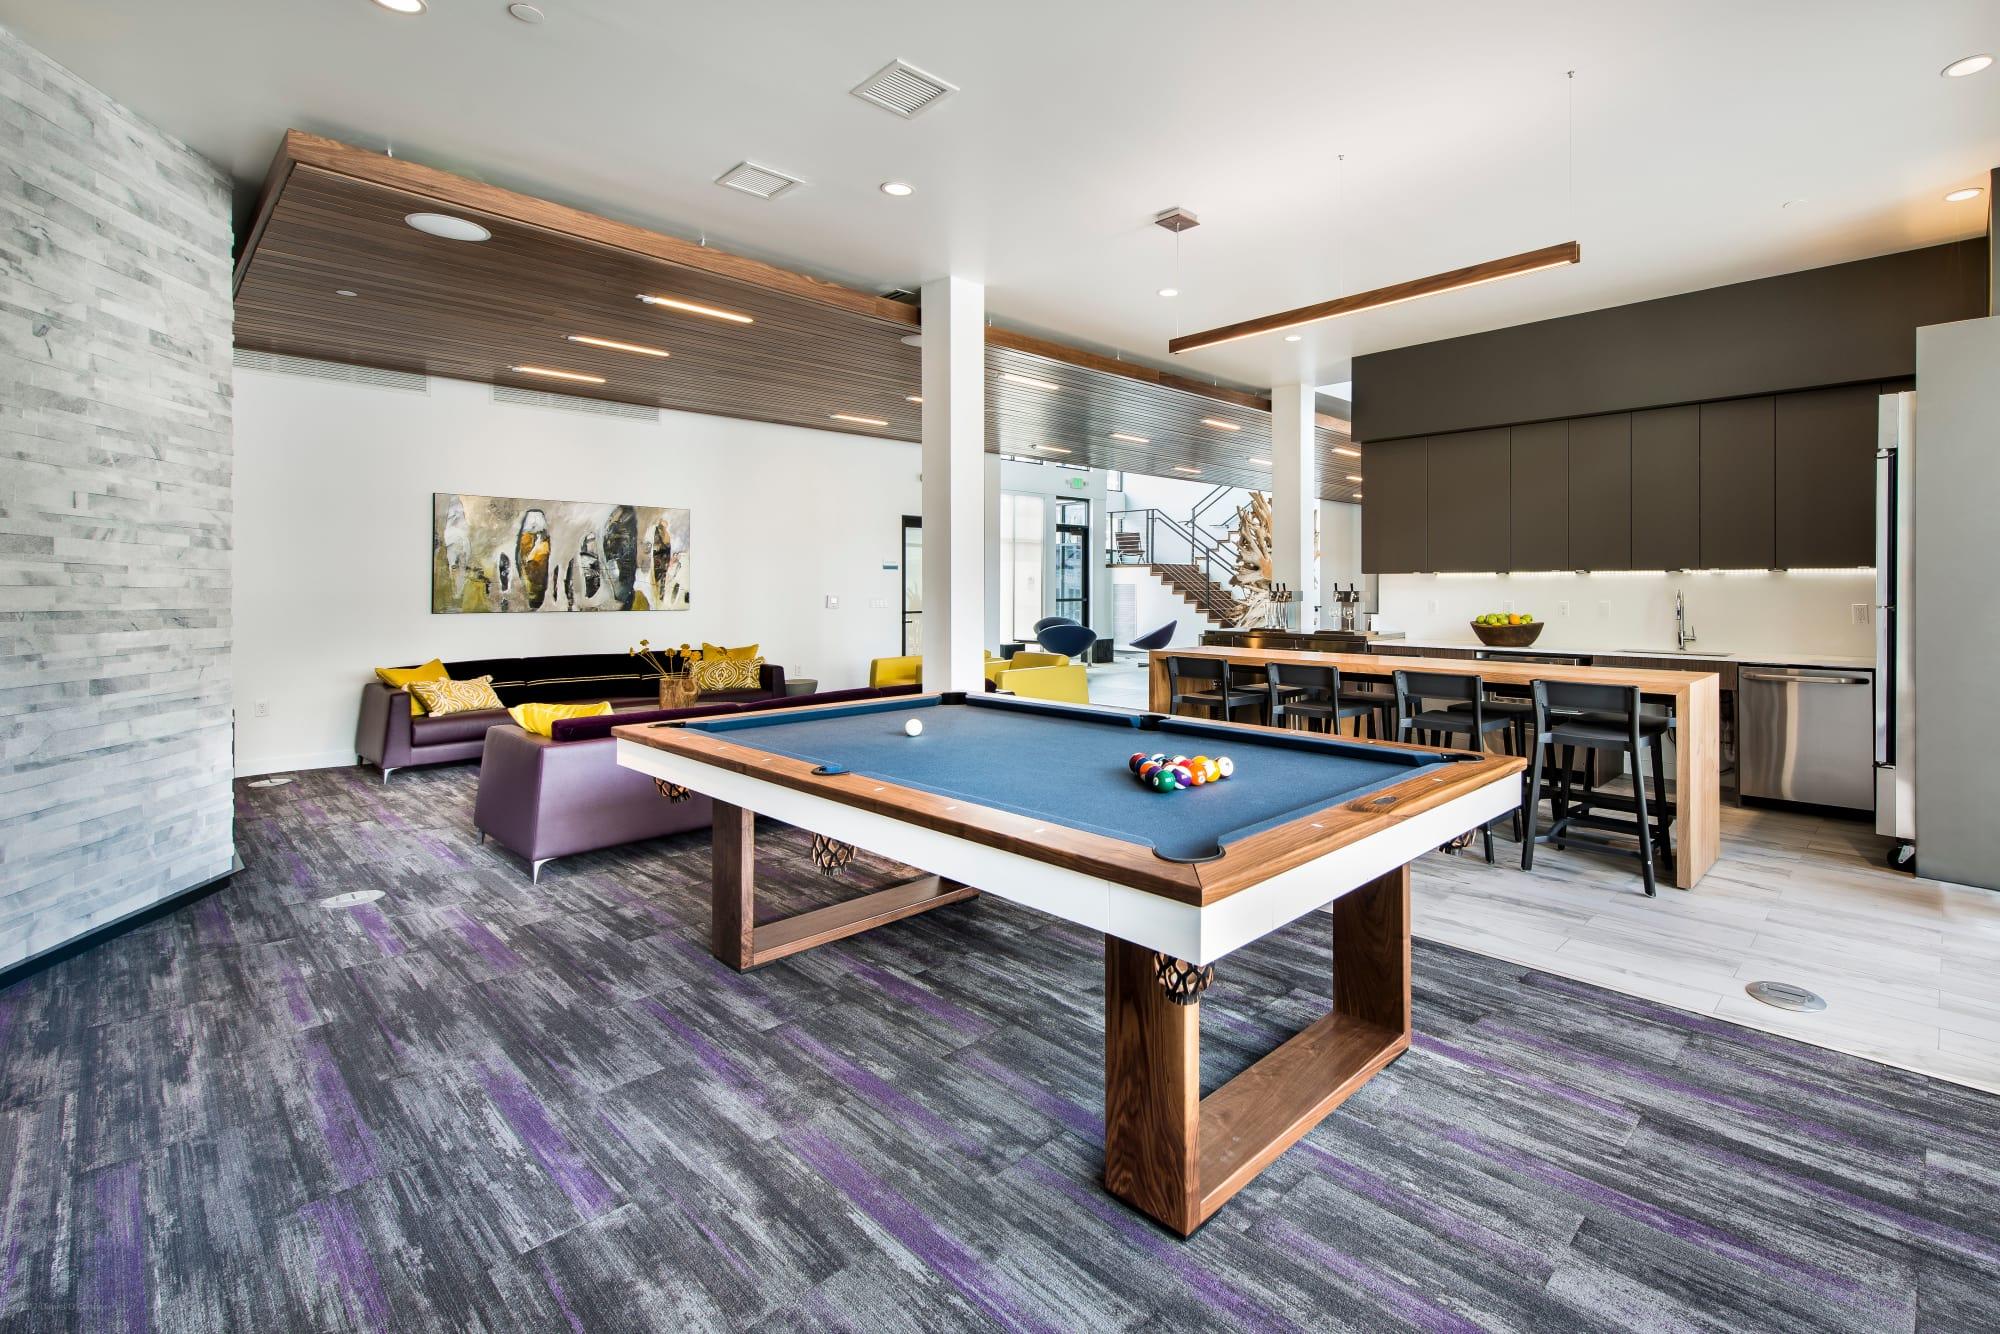 Billiards room at Elevate in Englewood, Colorado